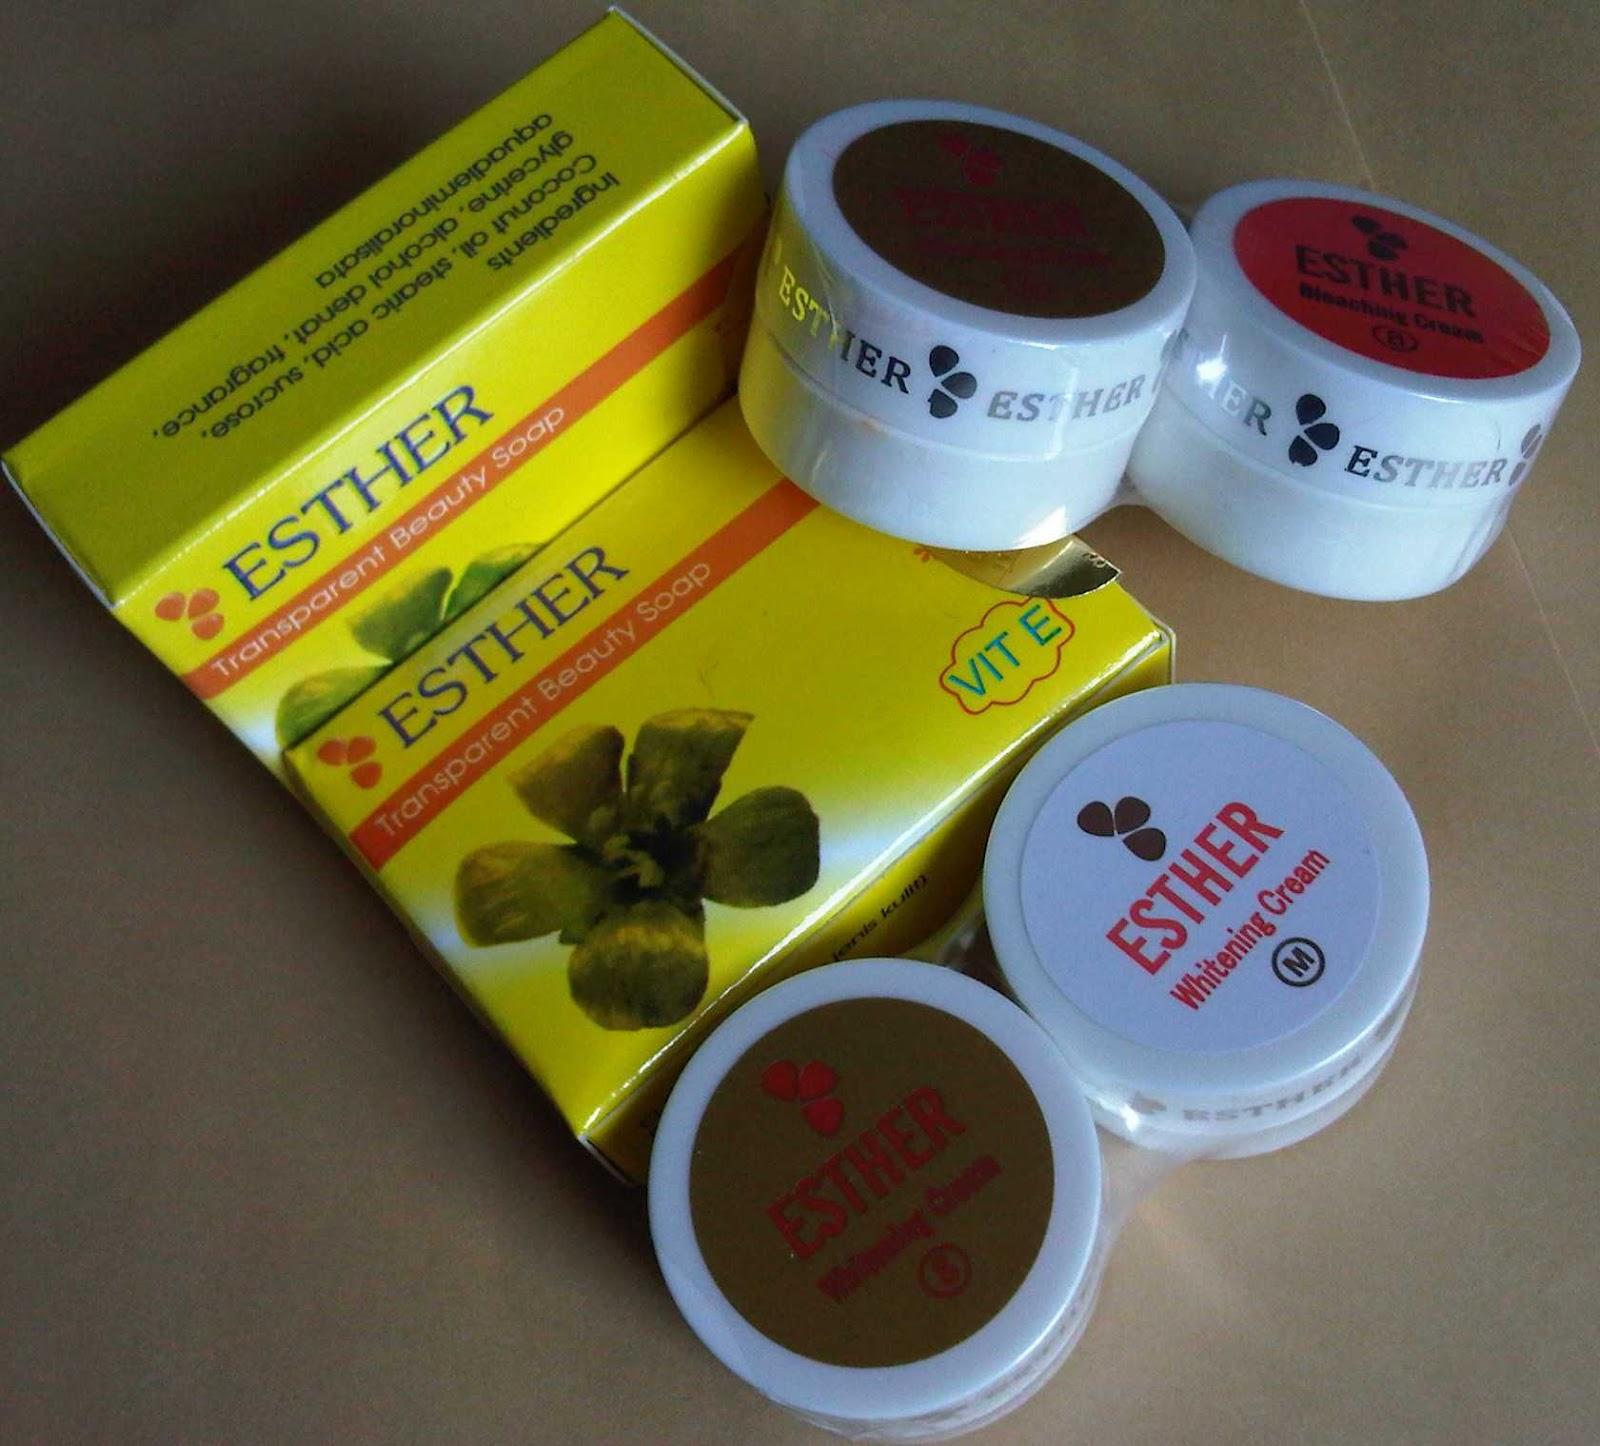 Jual Cream Esther Gold Paket Original Toko Kosmetik Setiawan Termurah Sabun Pemutih Wajah Melon Lightening Glosy